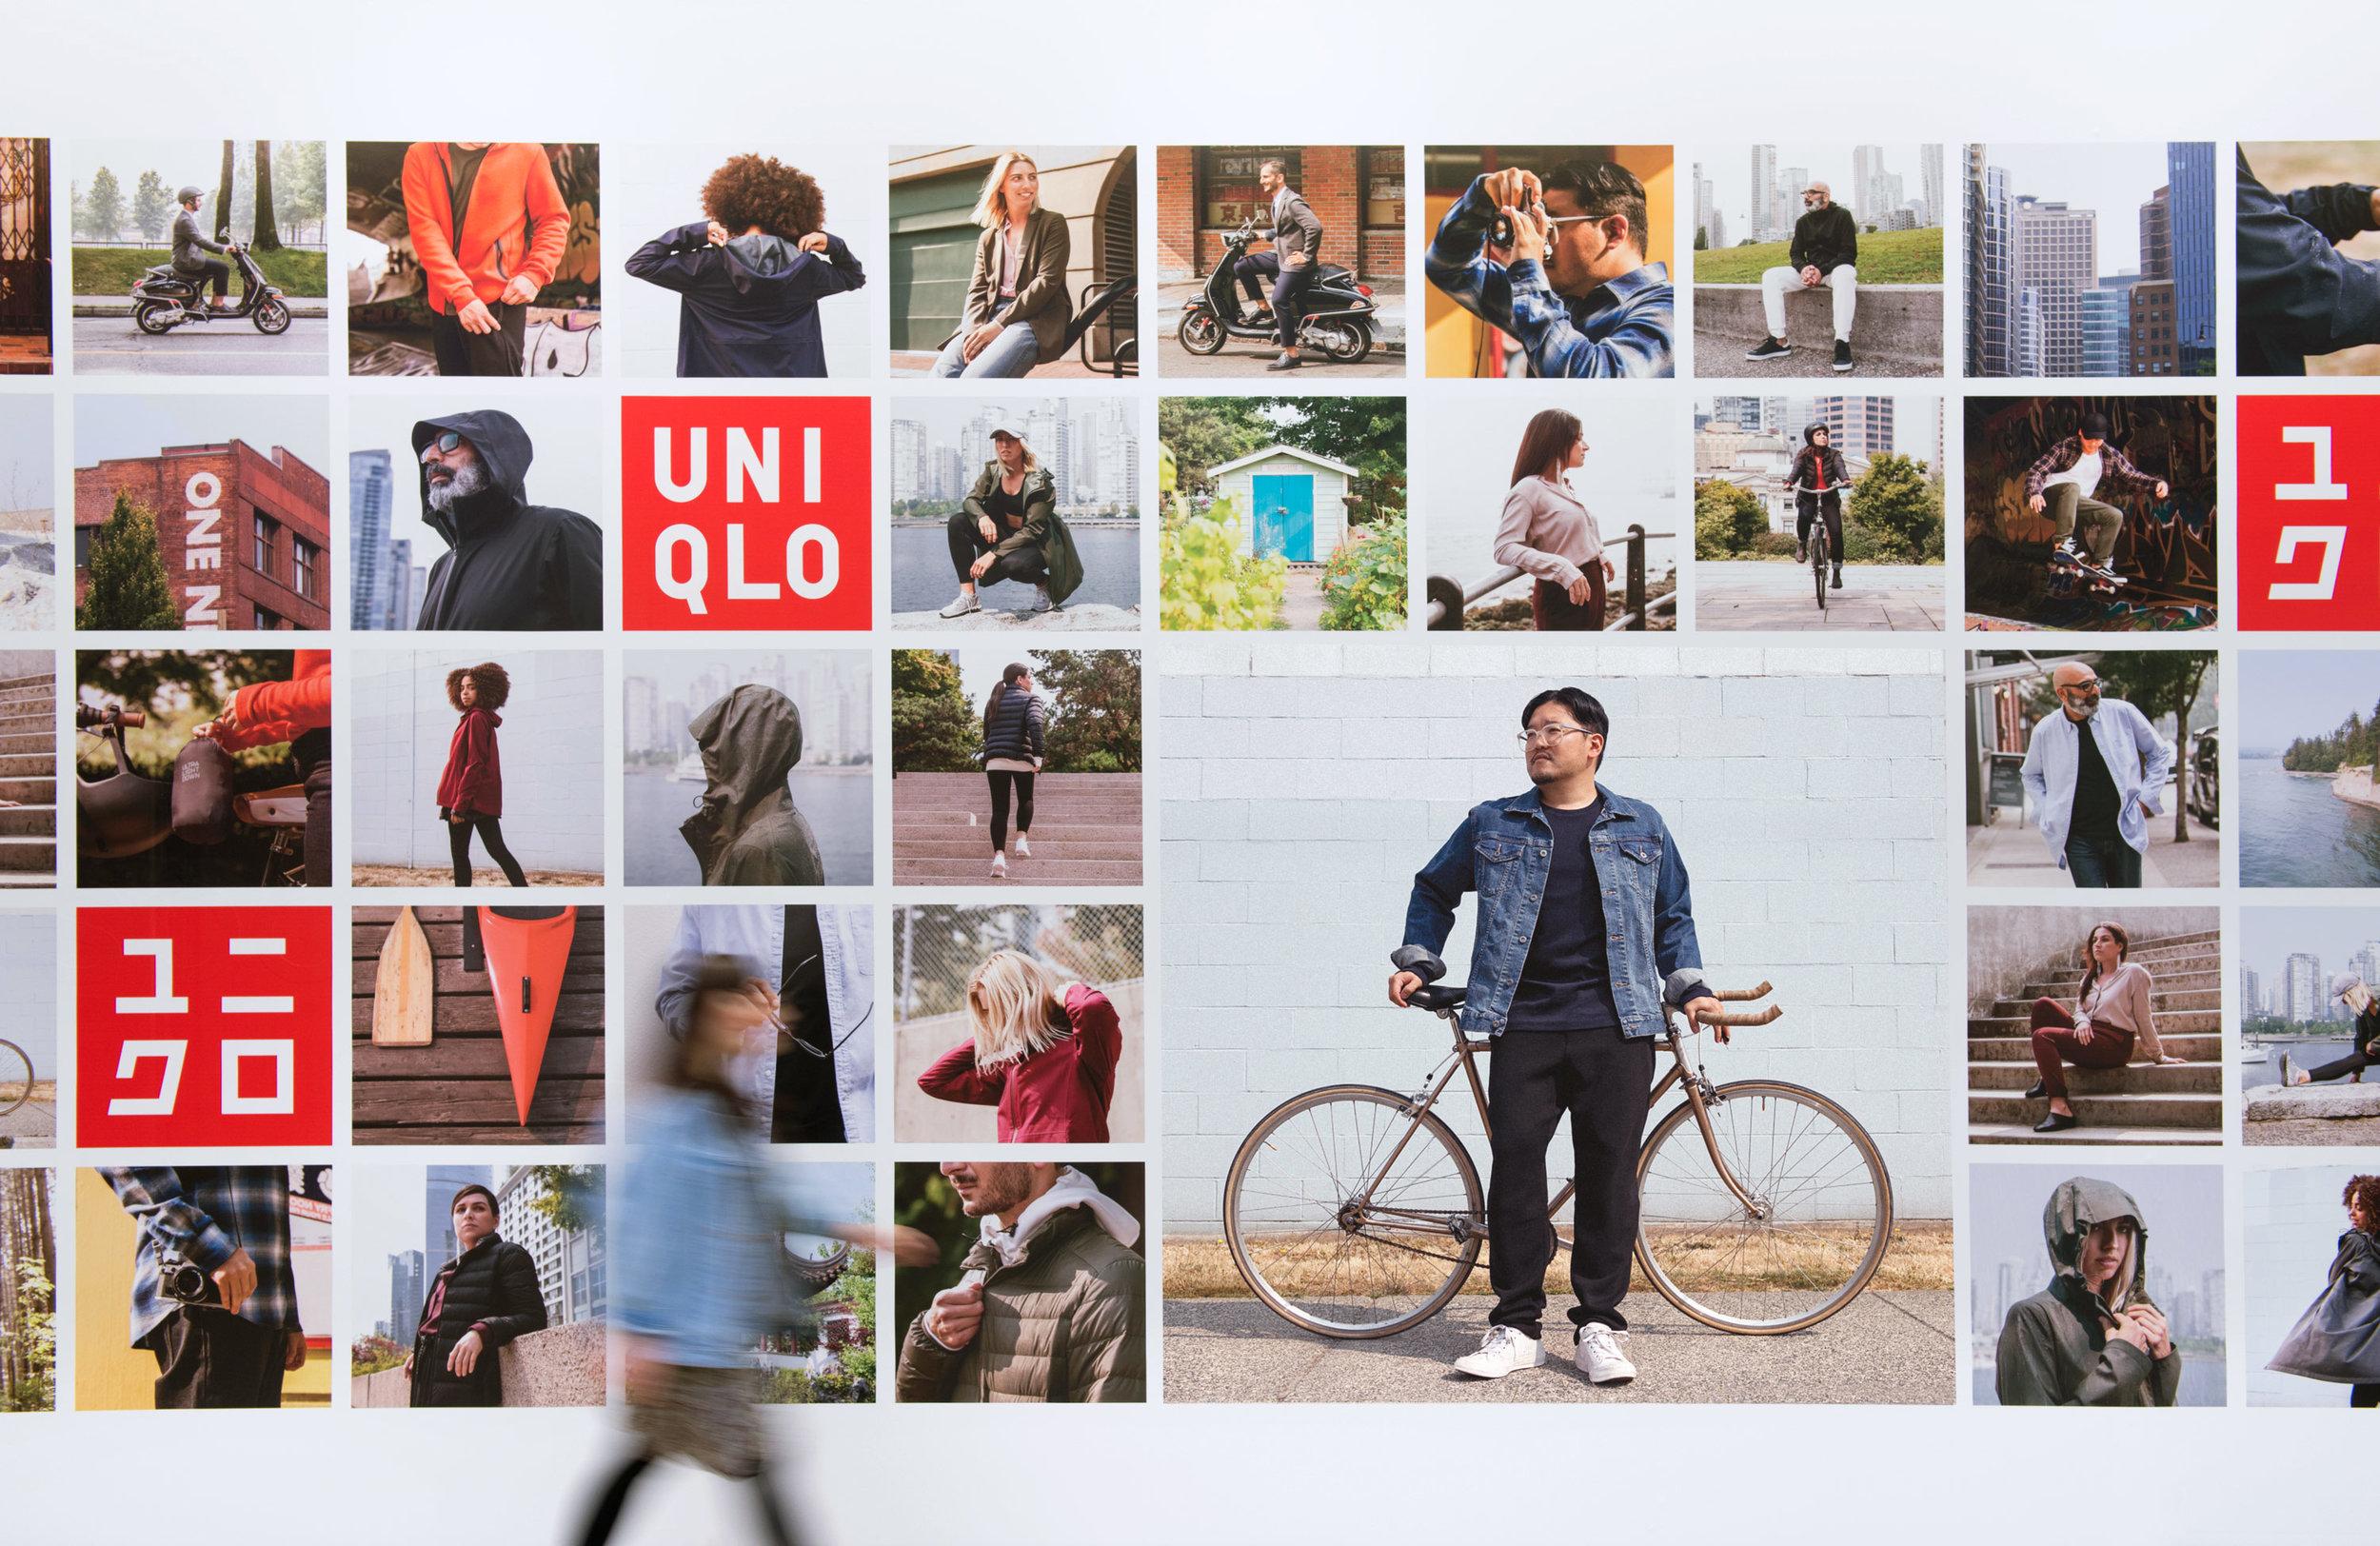 LDZxUNIQLO-Documentation-8818.jpg